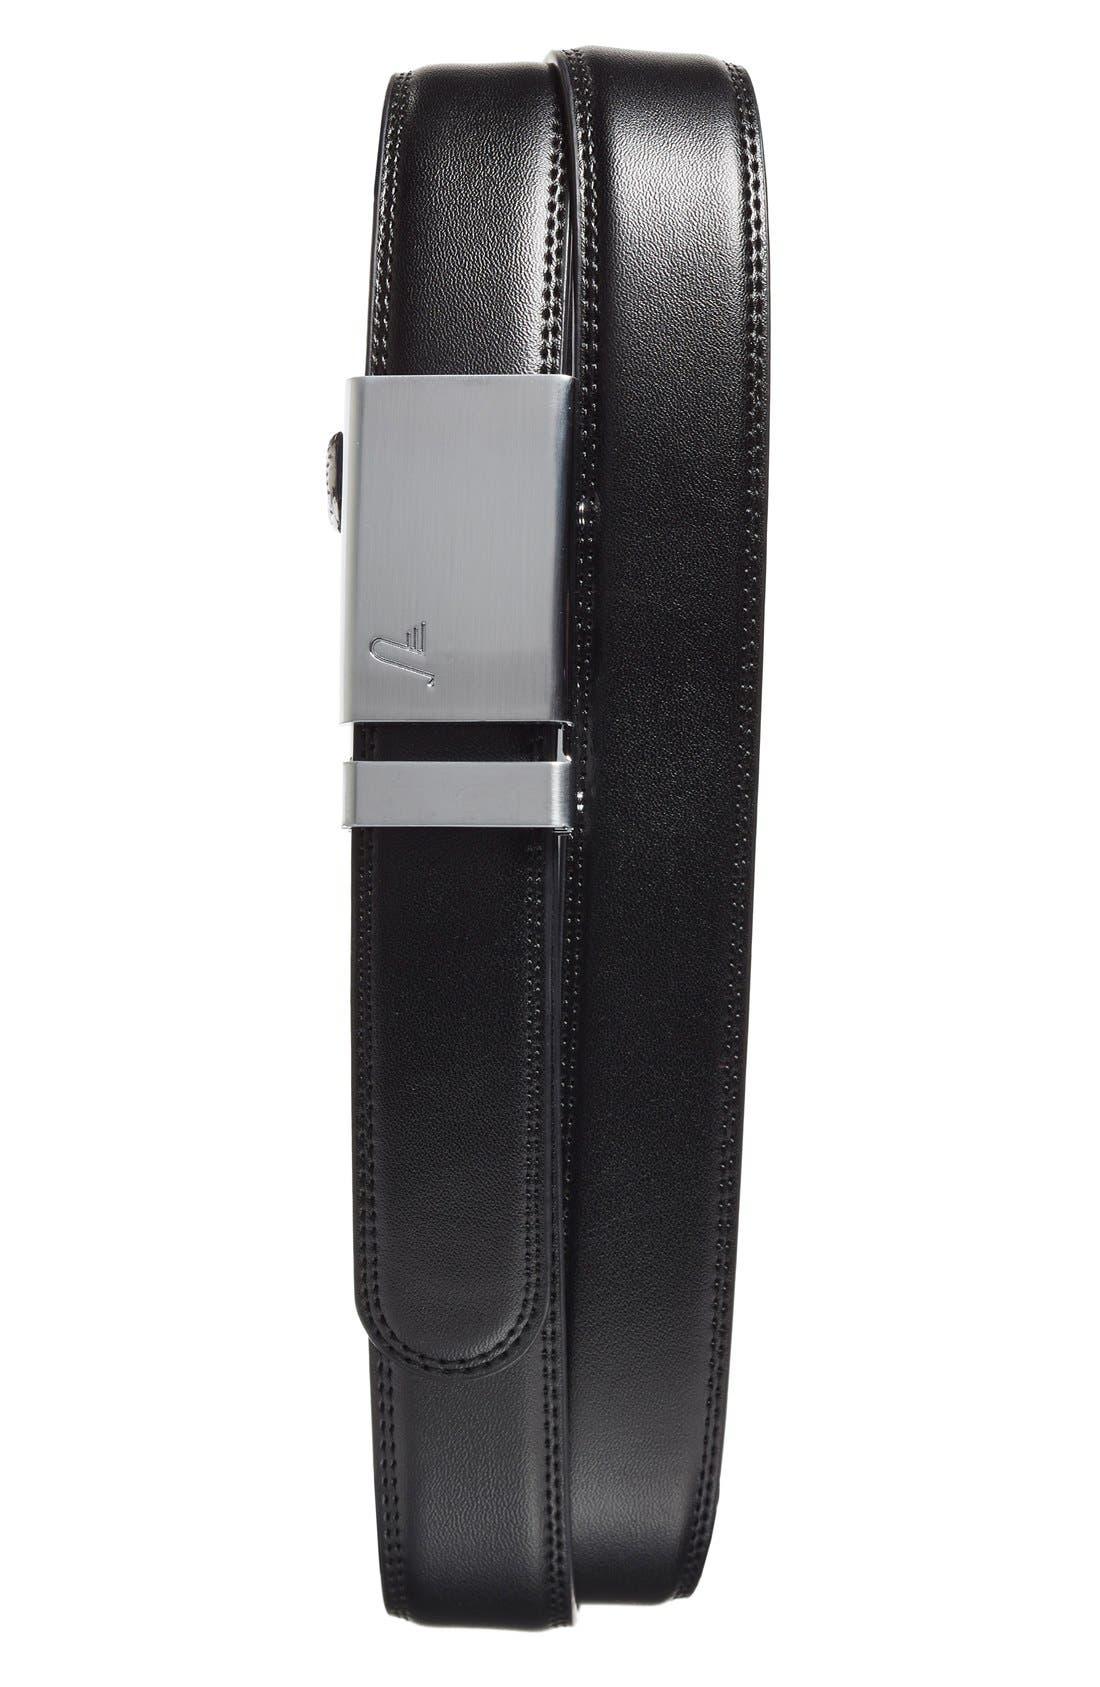 MISSION BELT, 'Alloy' Leather Belt, Main thumbnail 1, color, ALLOY/ BLACK